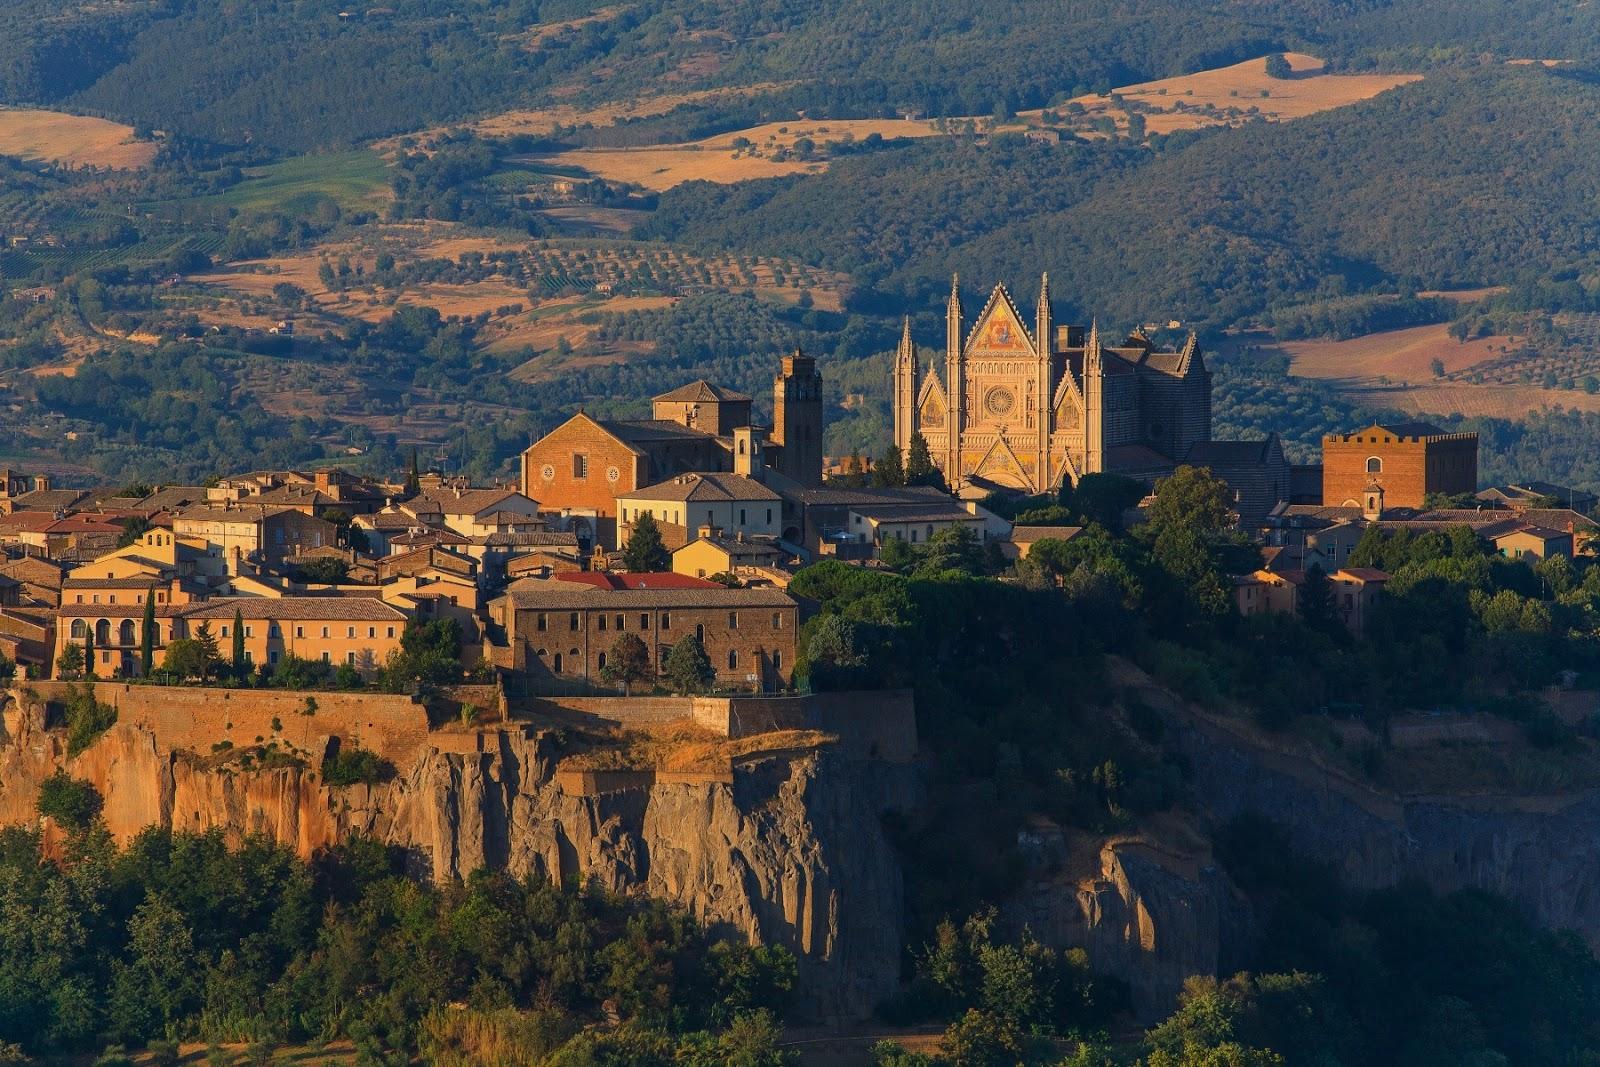 Umbria A voyage to the Umbria region Italy Europe Perugia